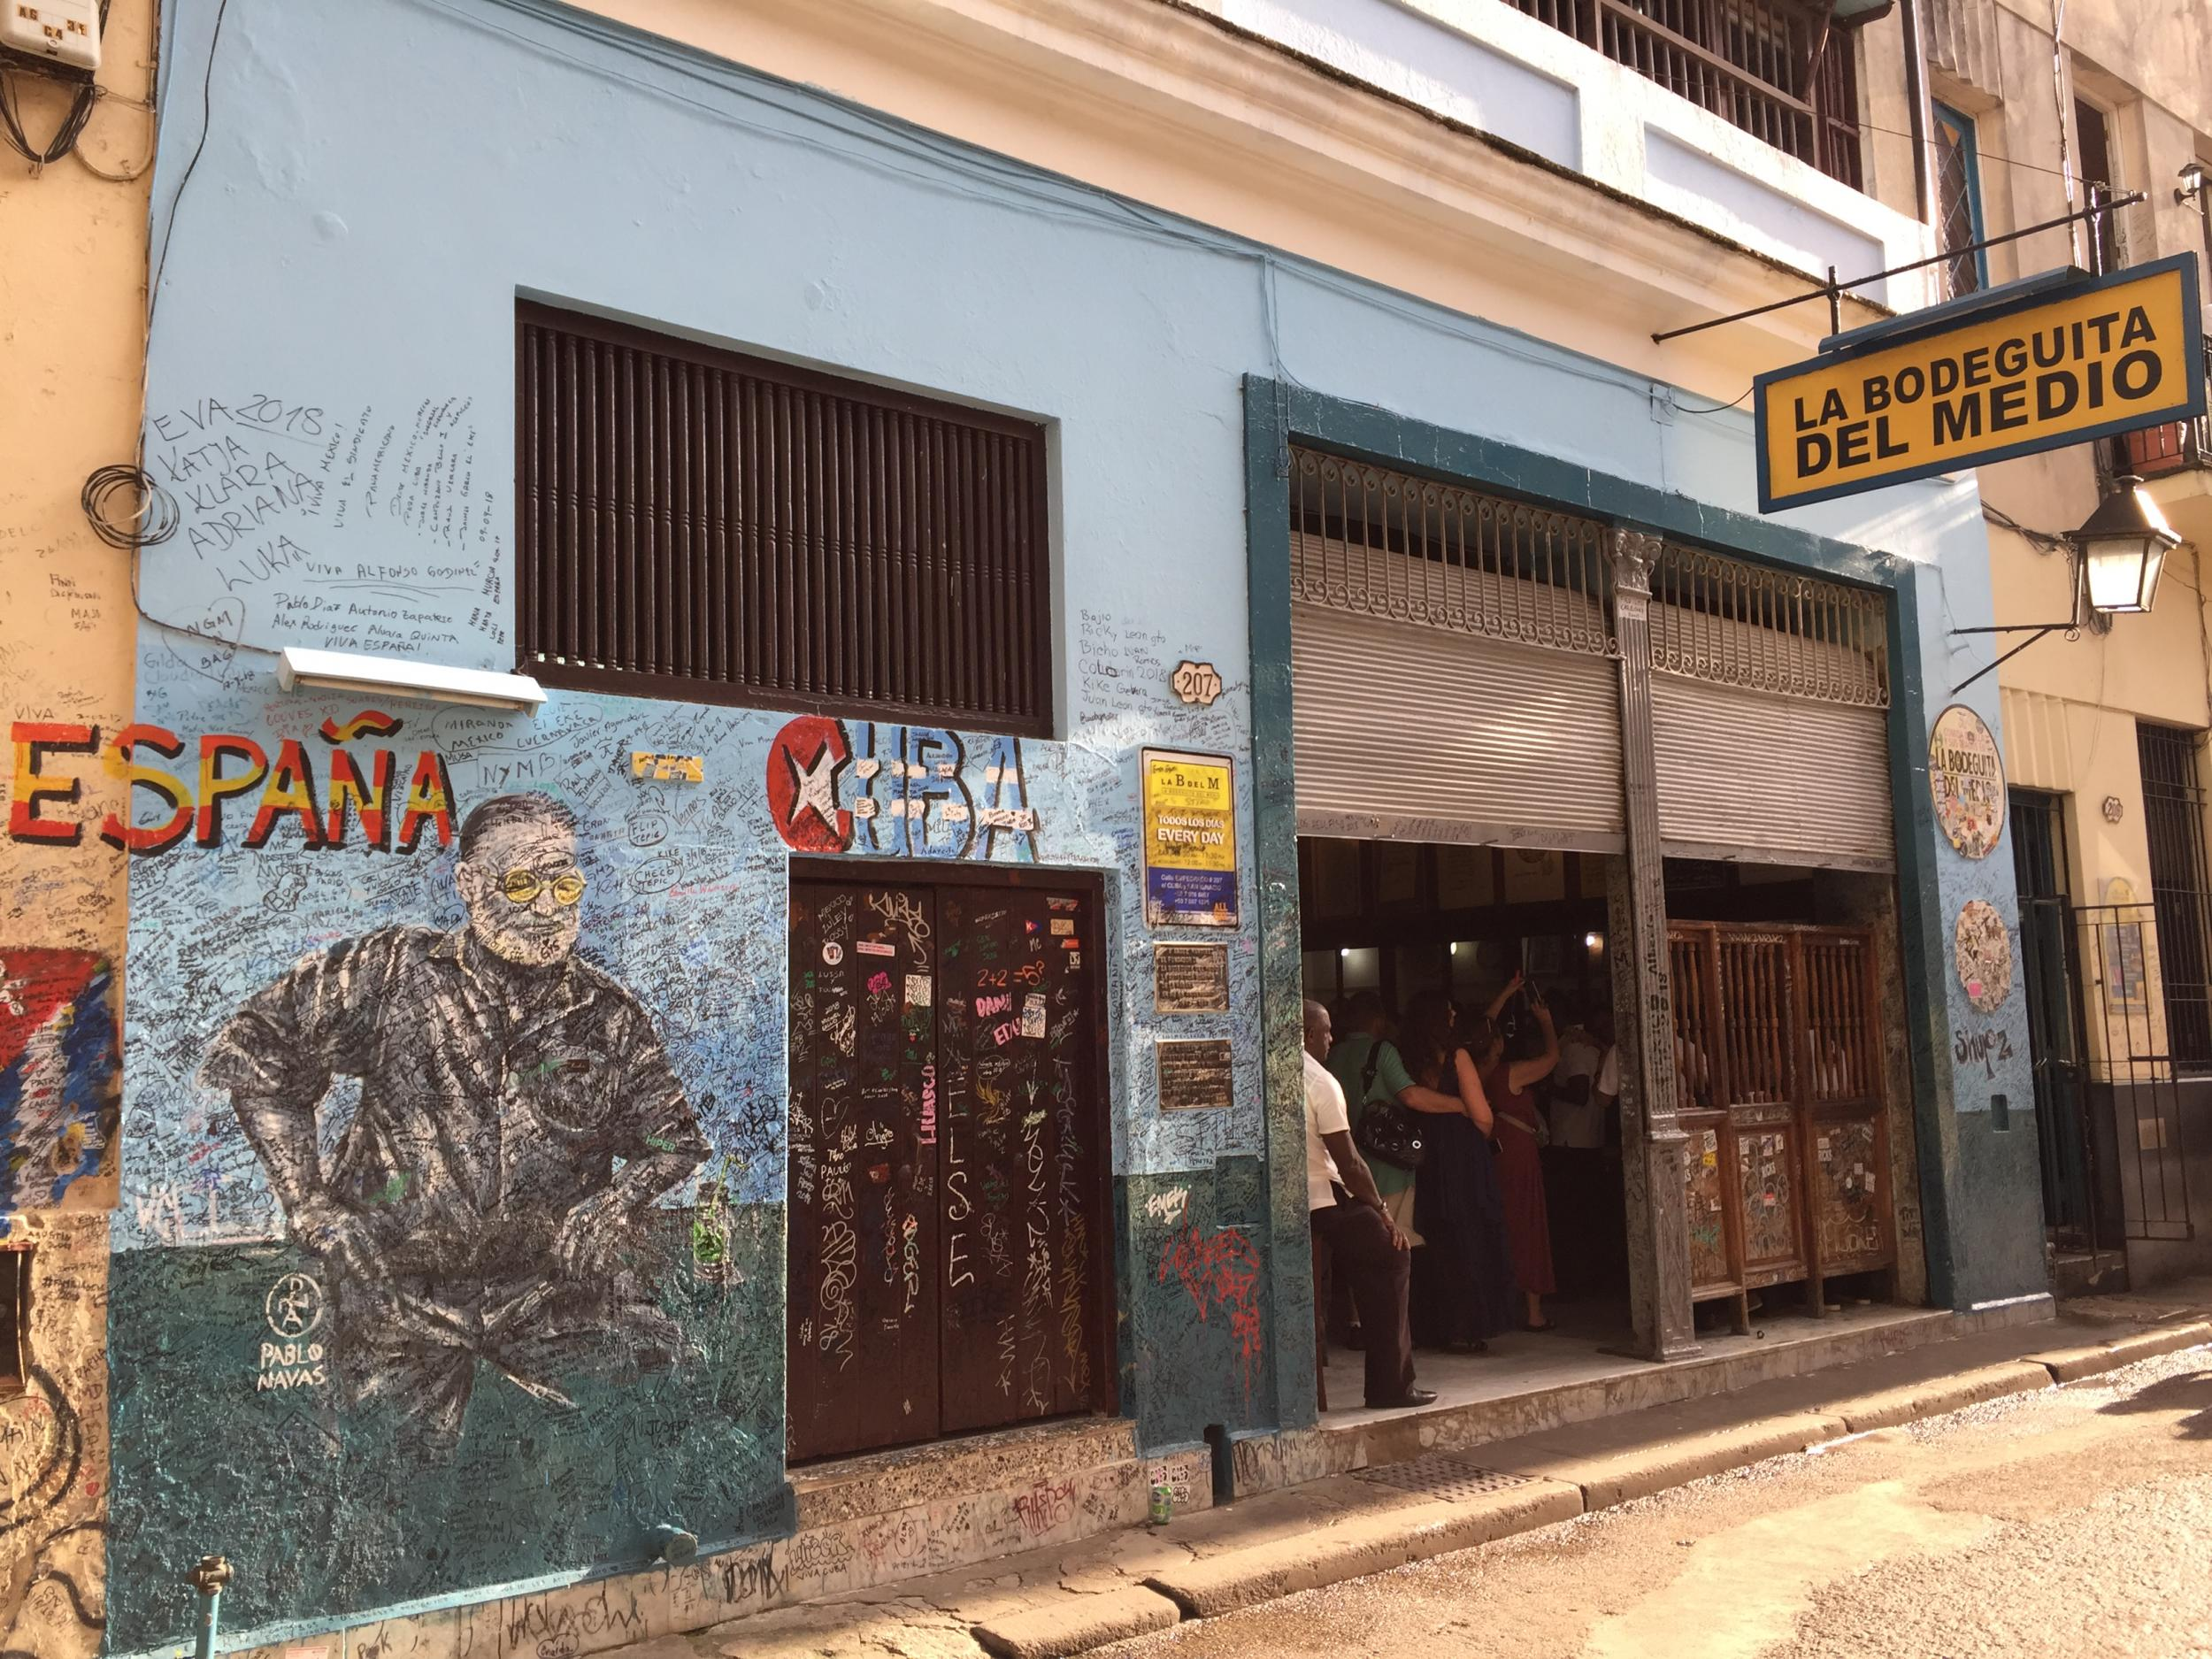 How to explore Ernest Hemingway's Cuba